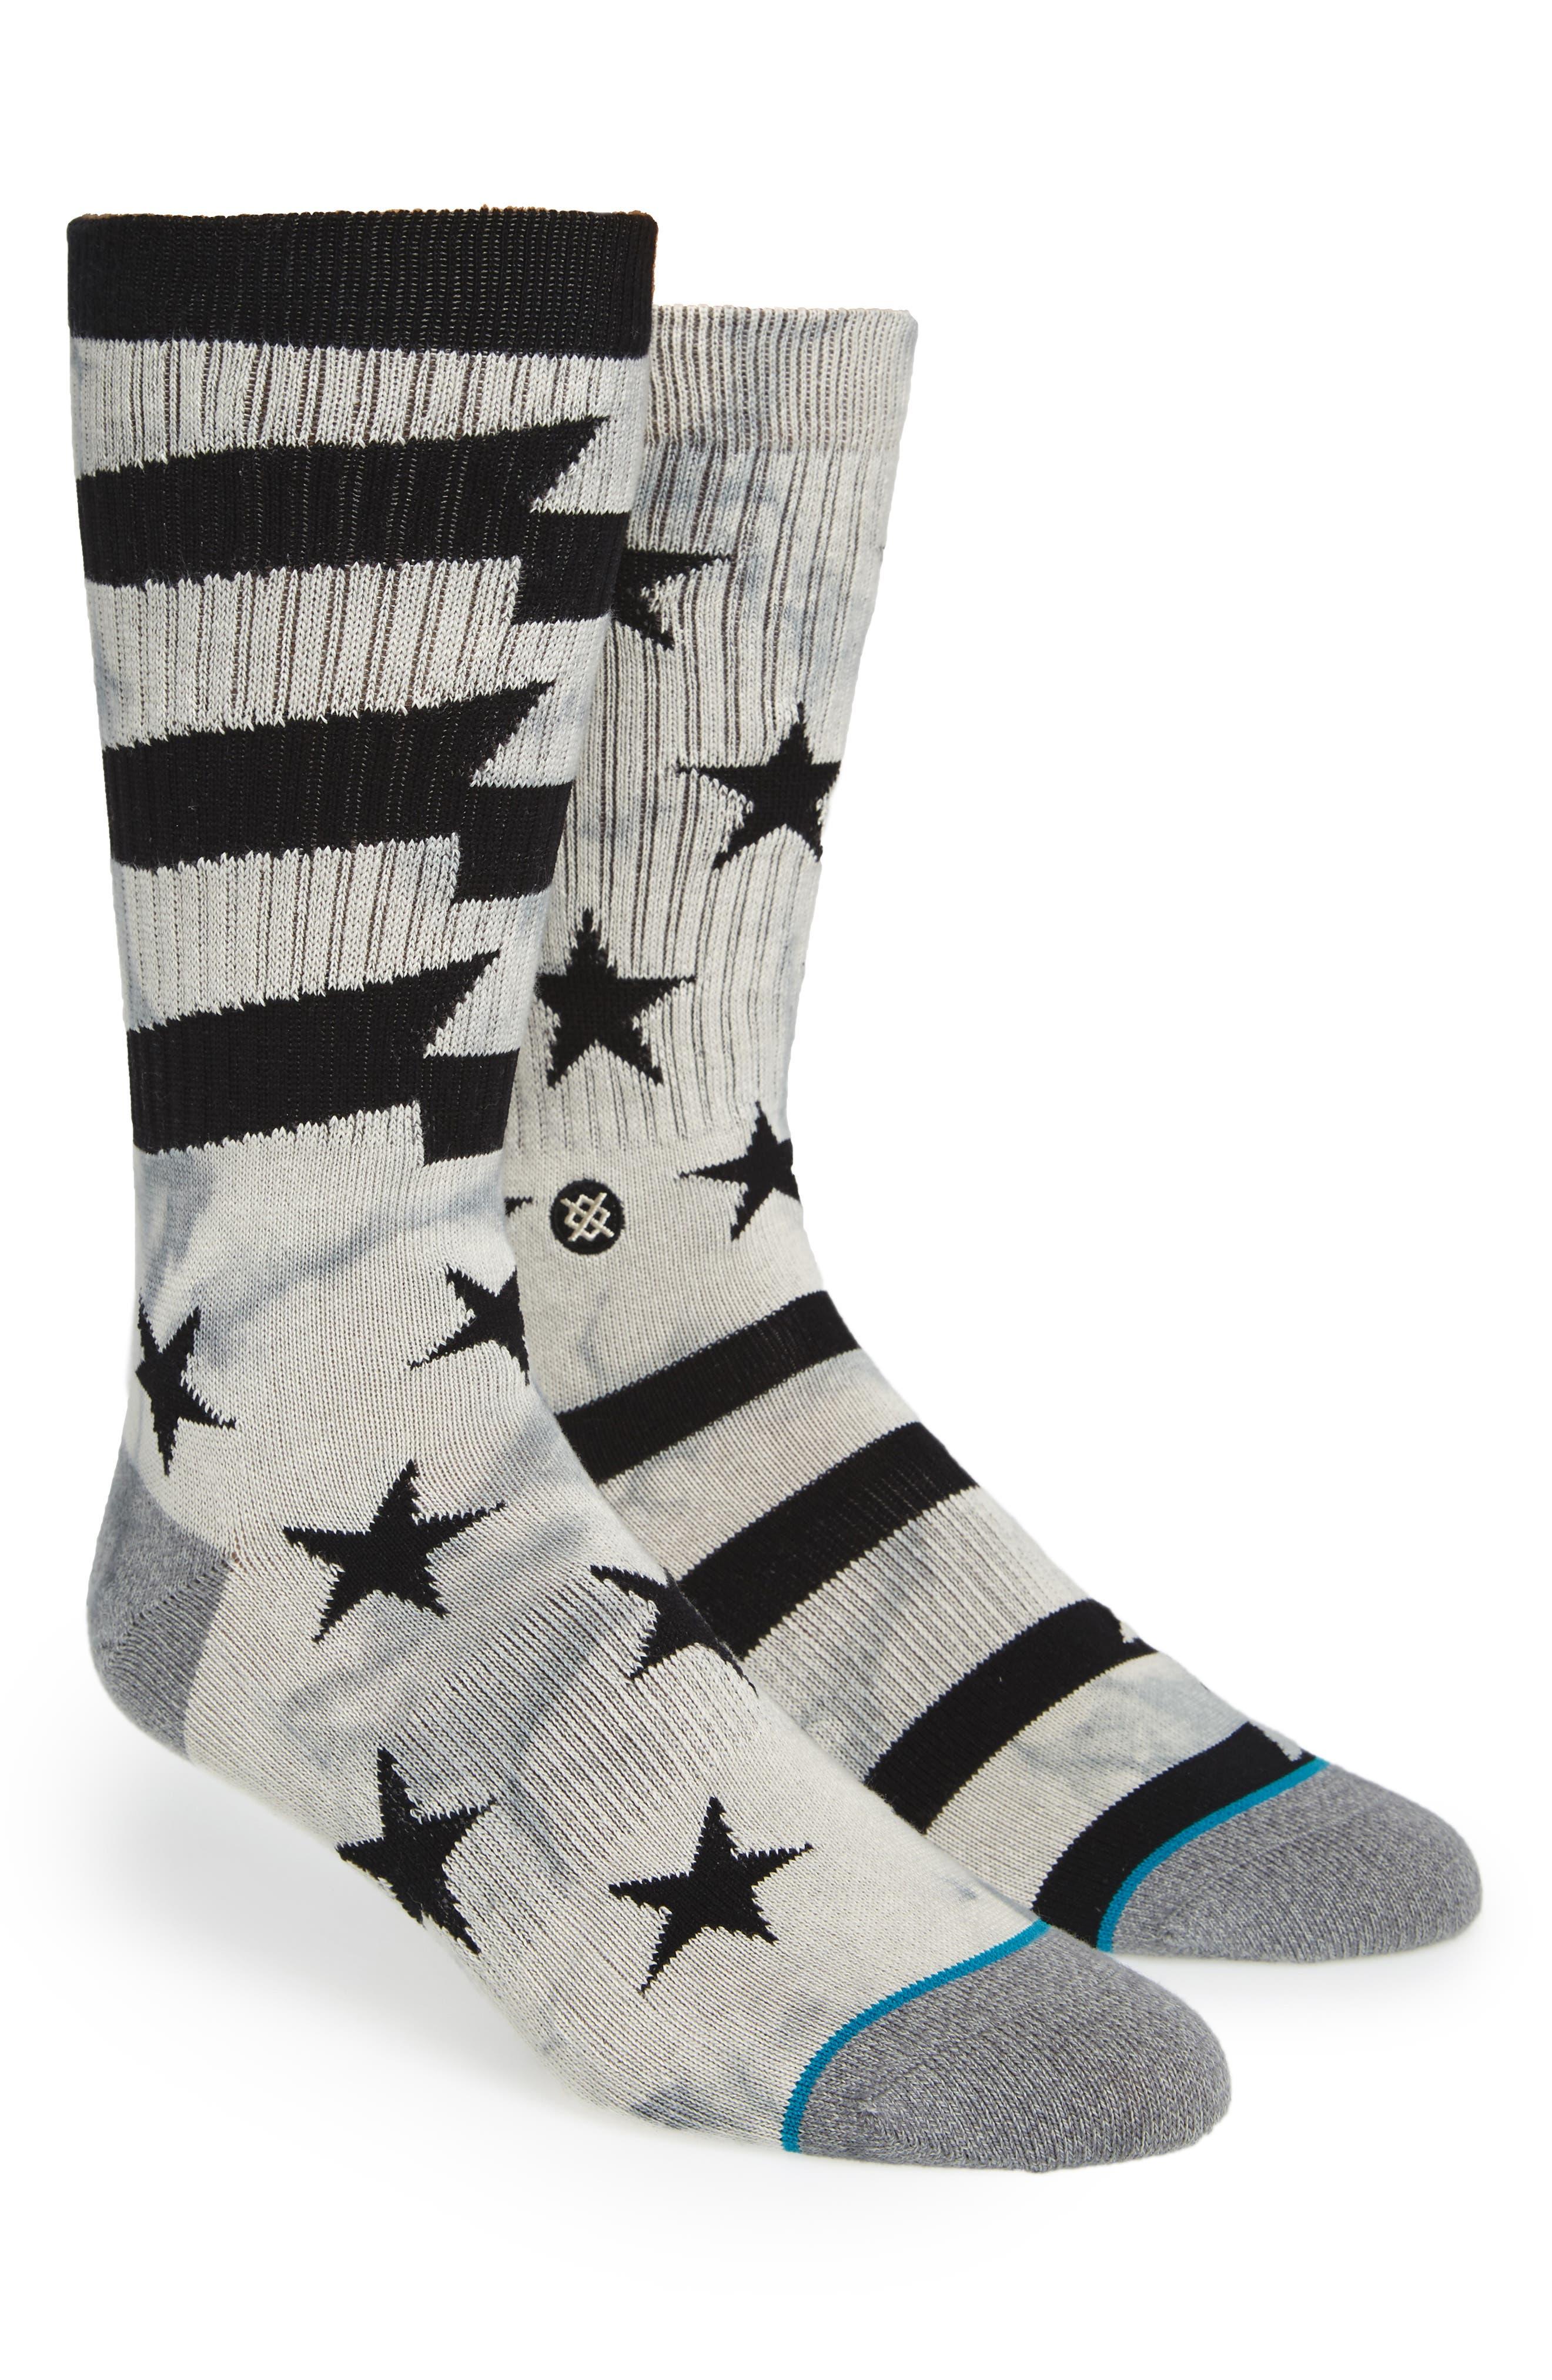 Sidereal Crew Socks,                         Main,                         color, 030